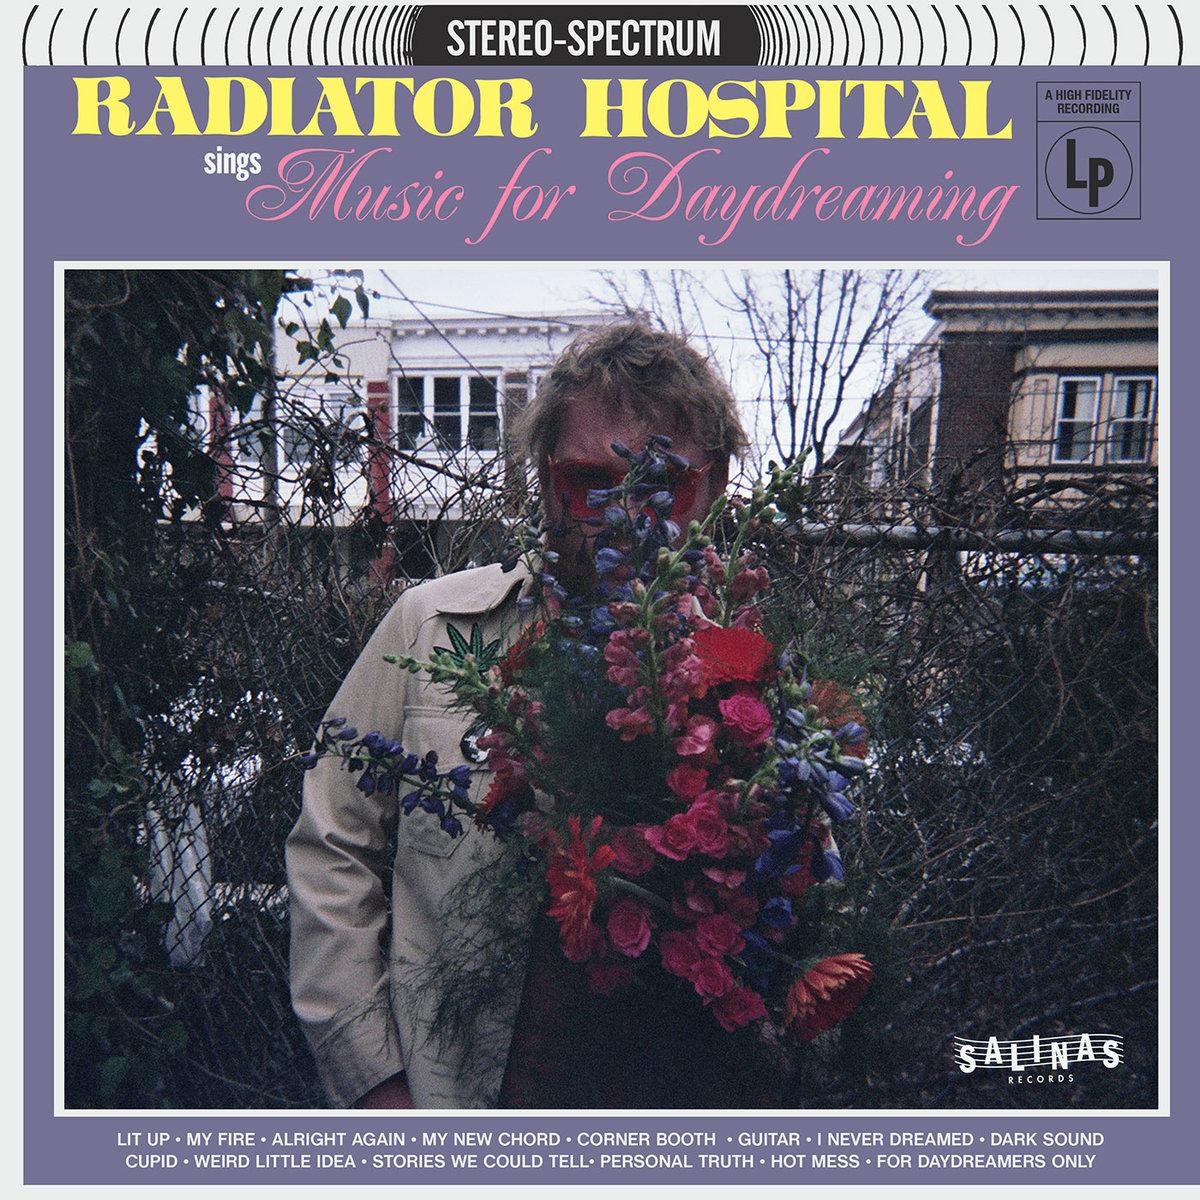 Radiator Hospital - Music For Daydreaming LP